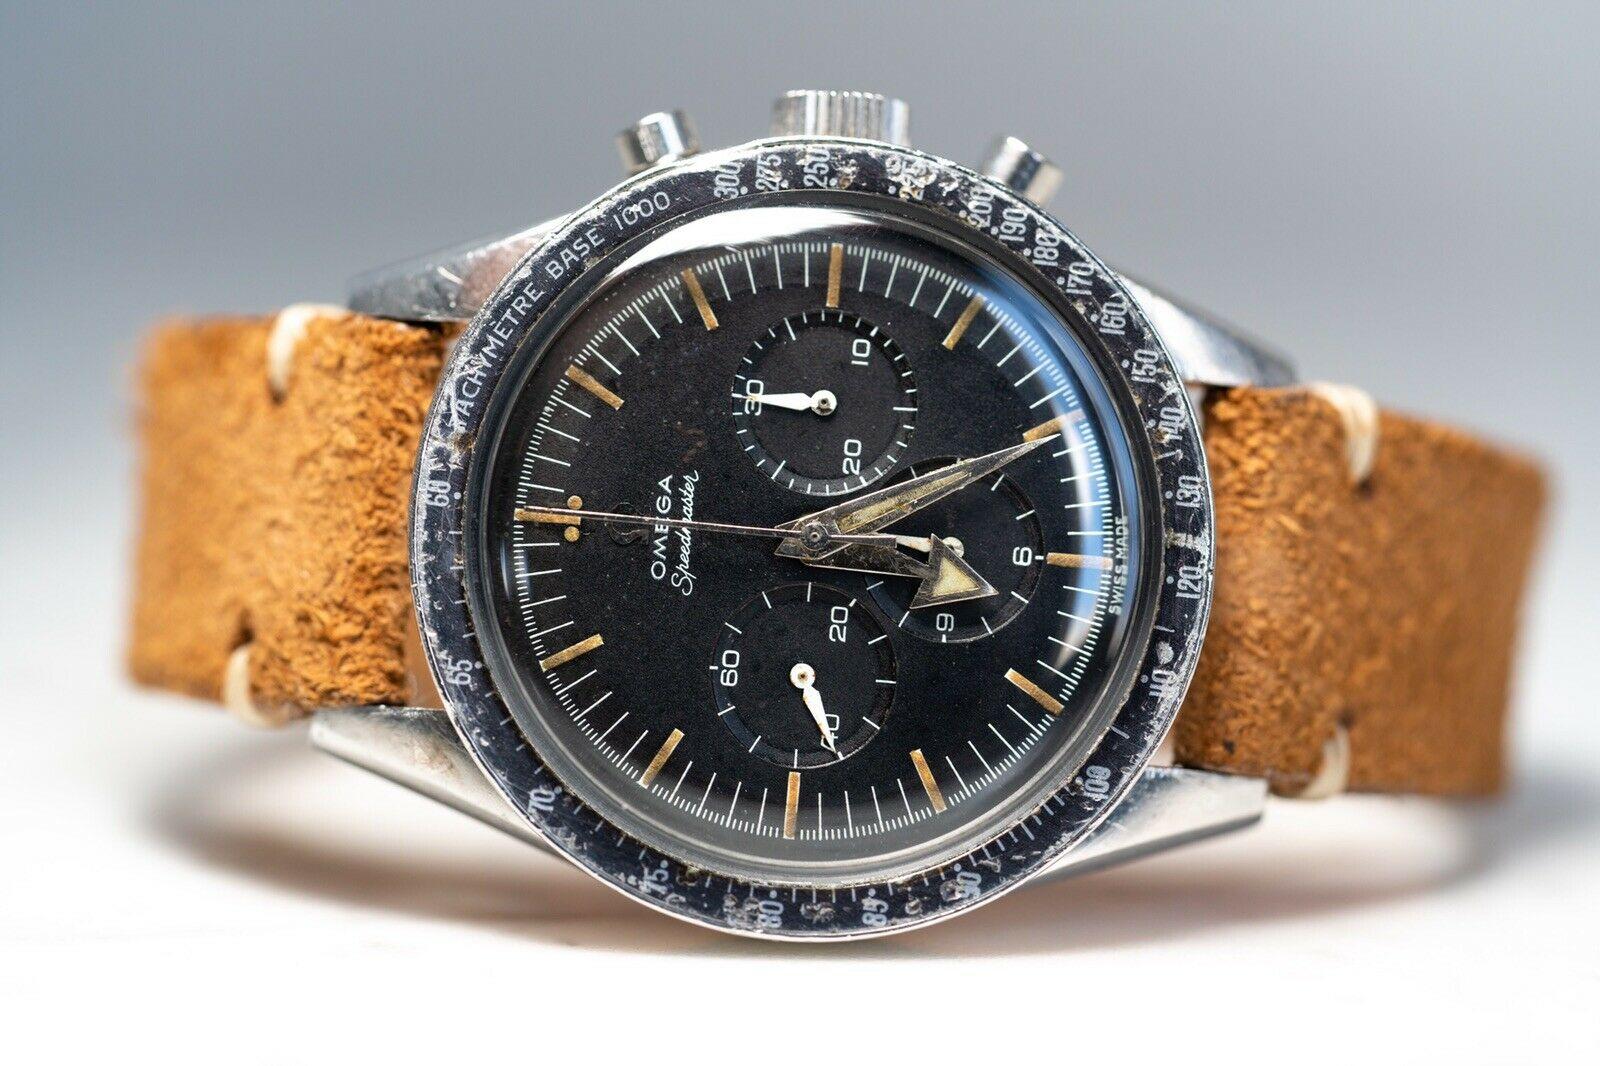 Omega Speedmaster CK 2915